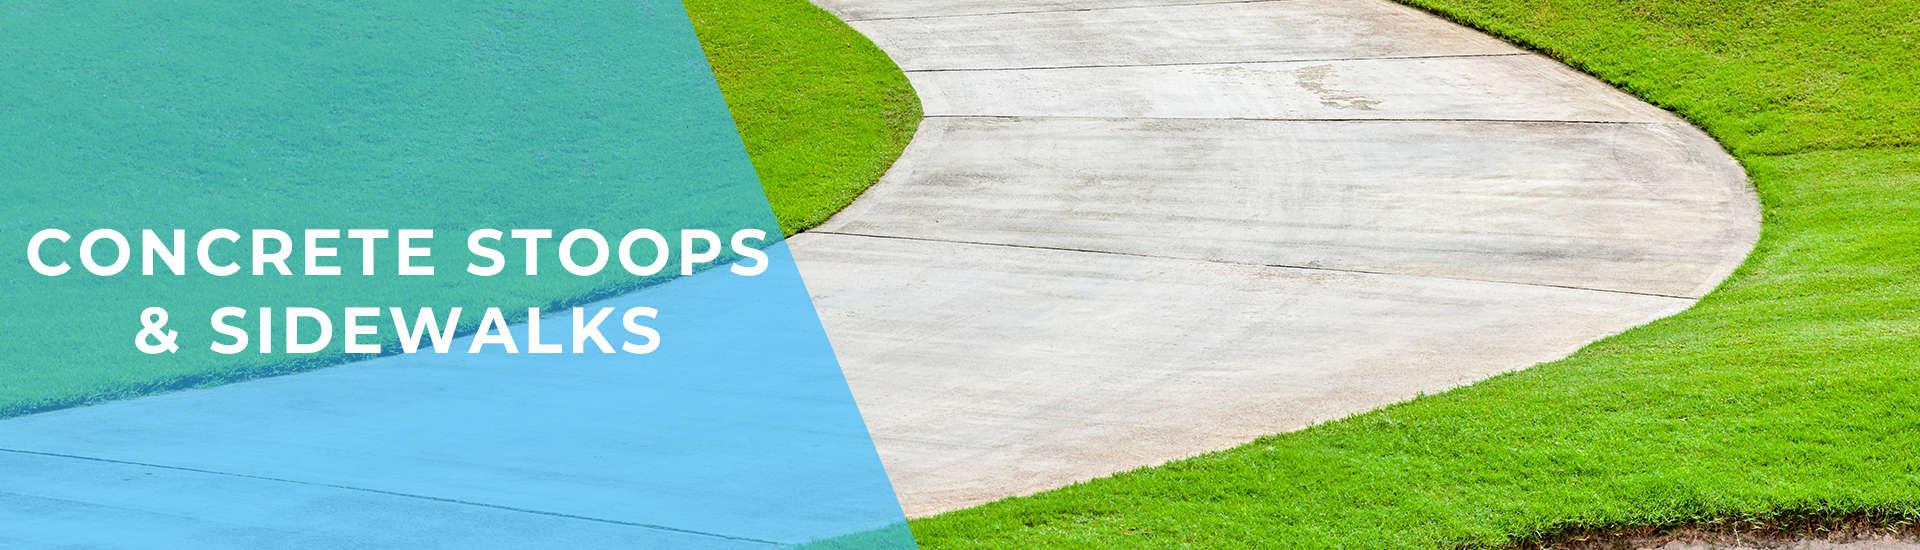 Concrete Stoops & Sidewalks